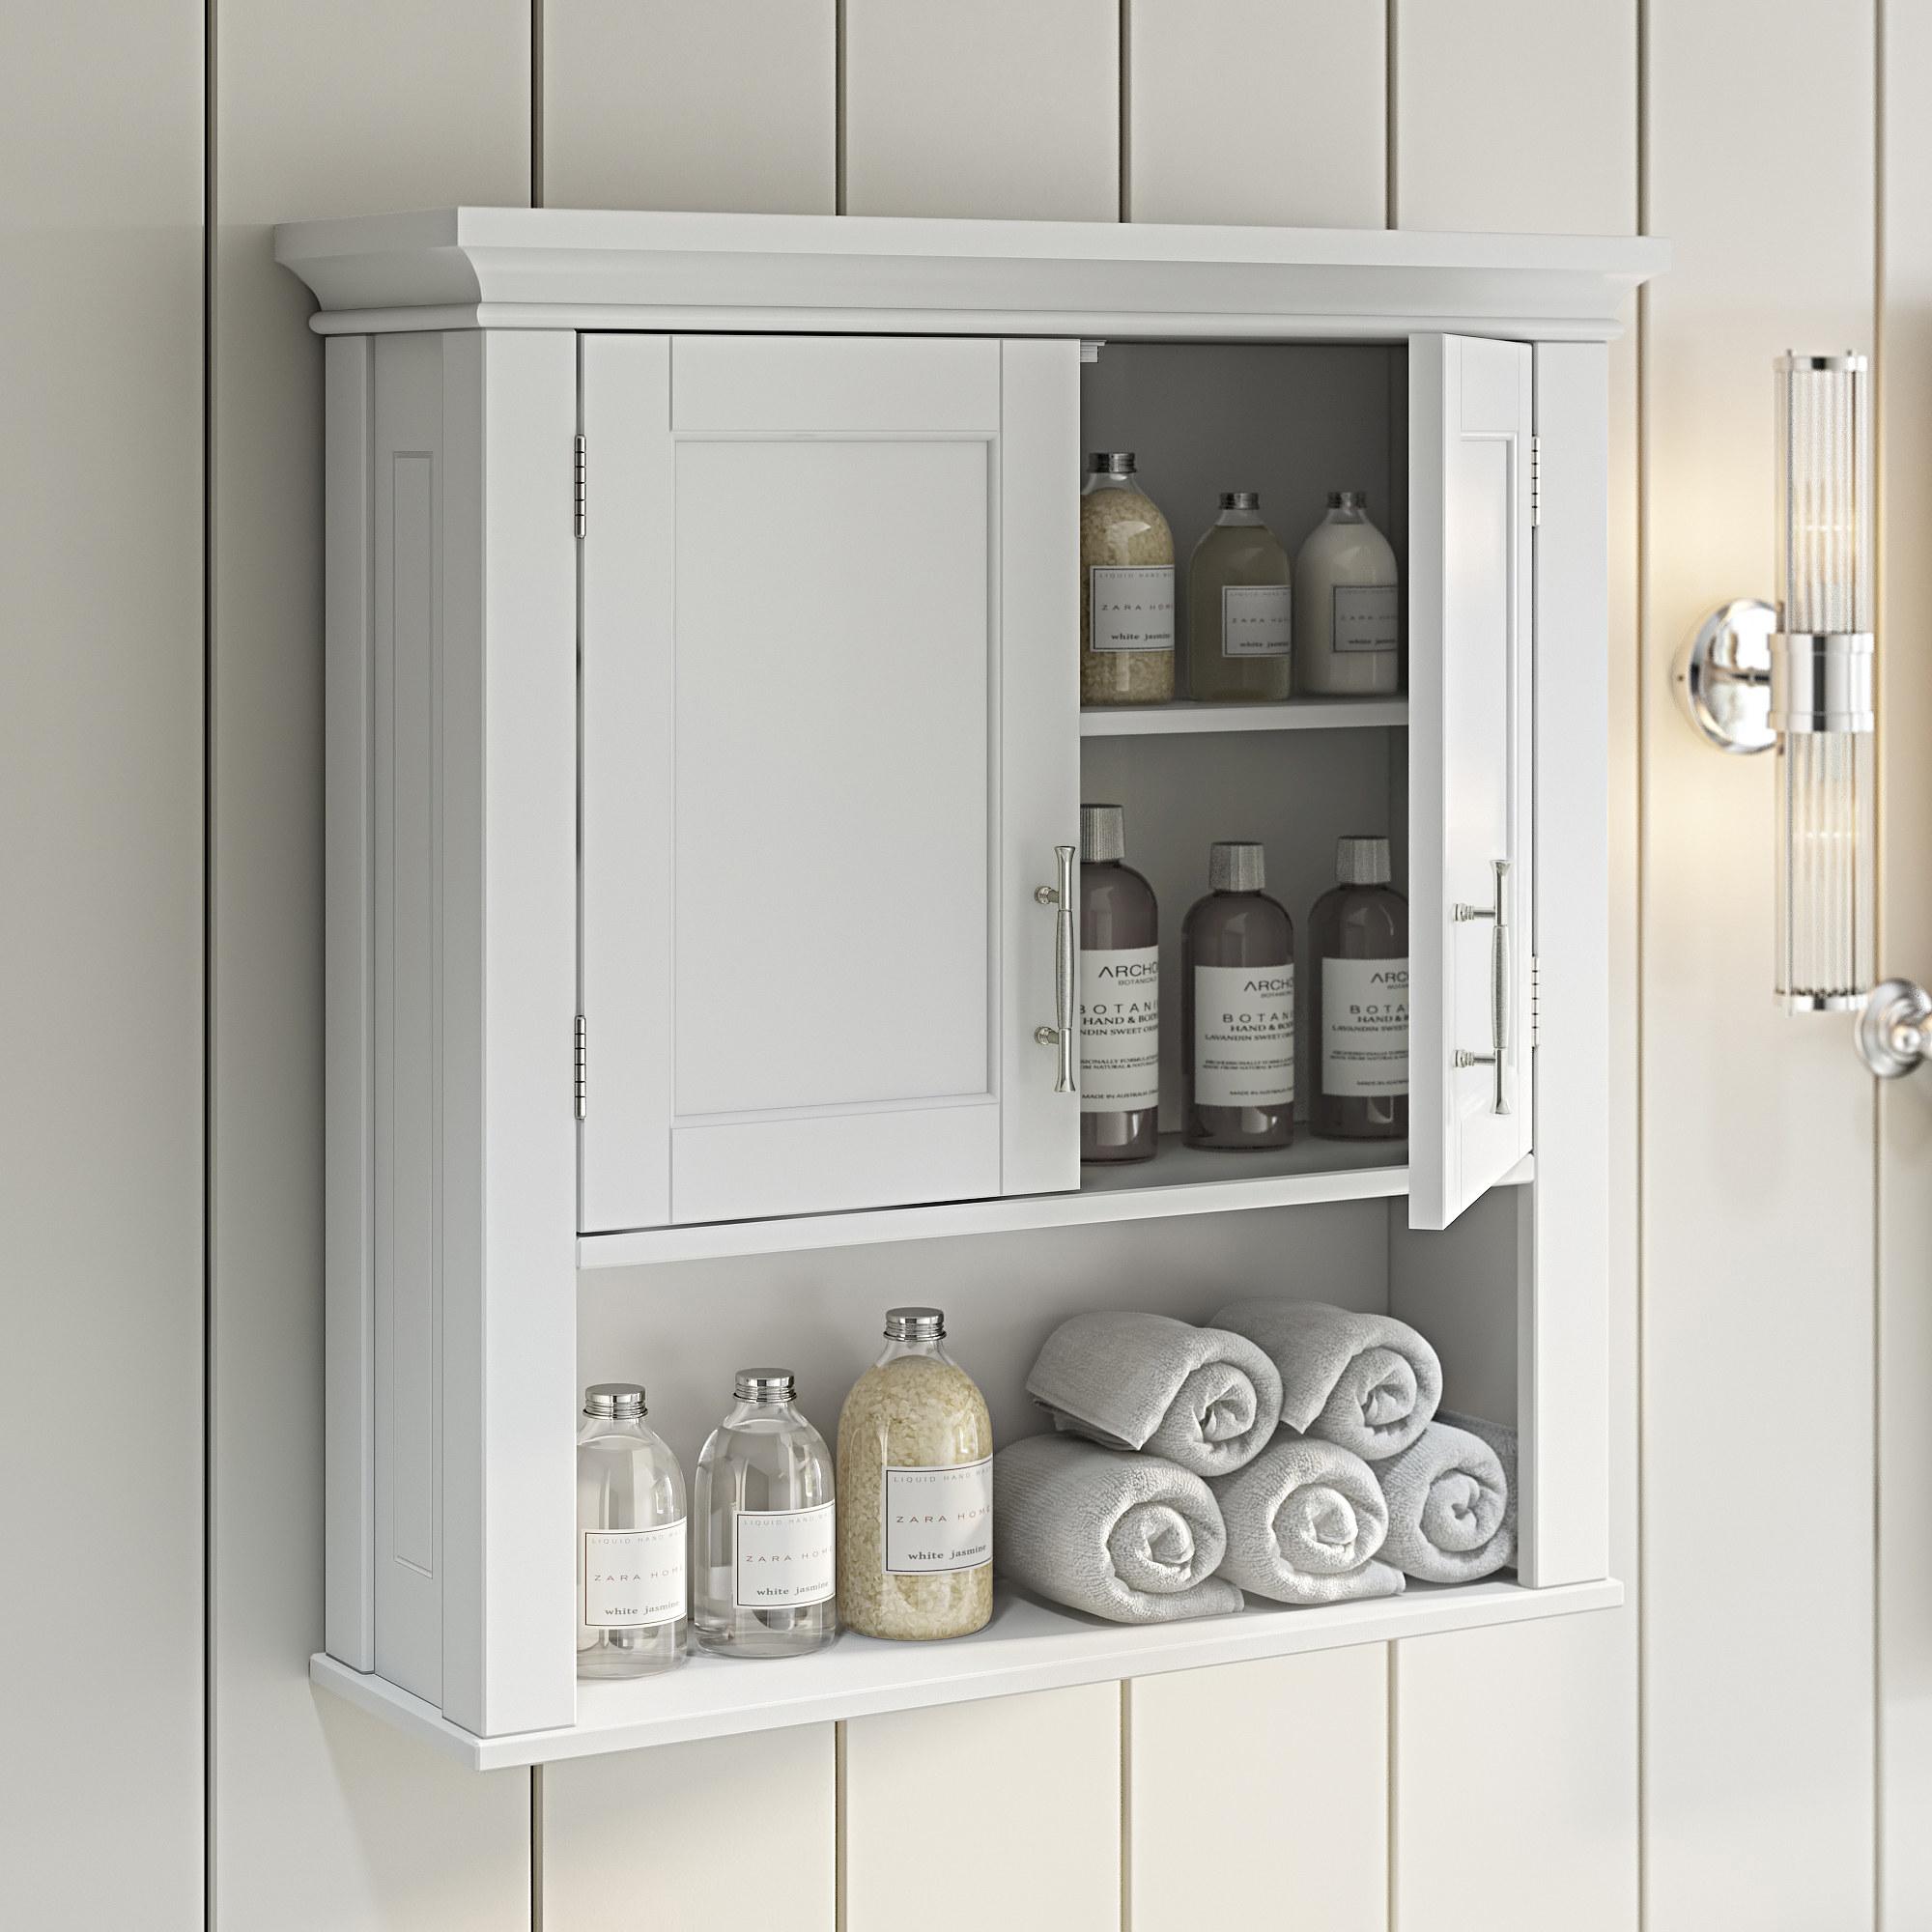 The white bathroom storage cabinet